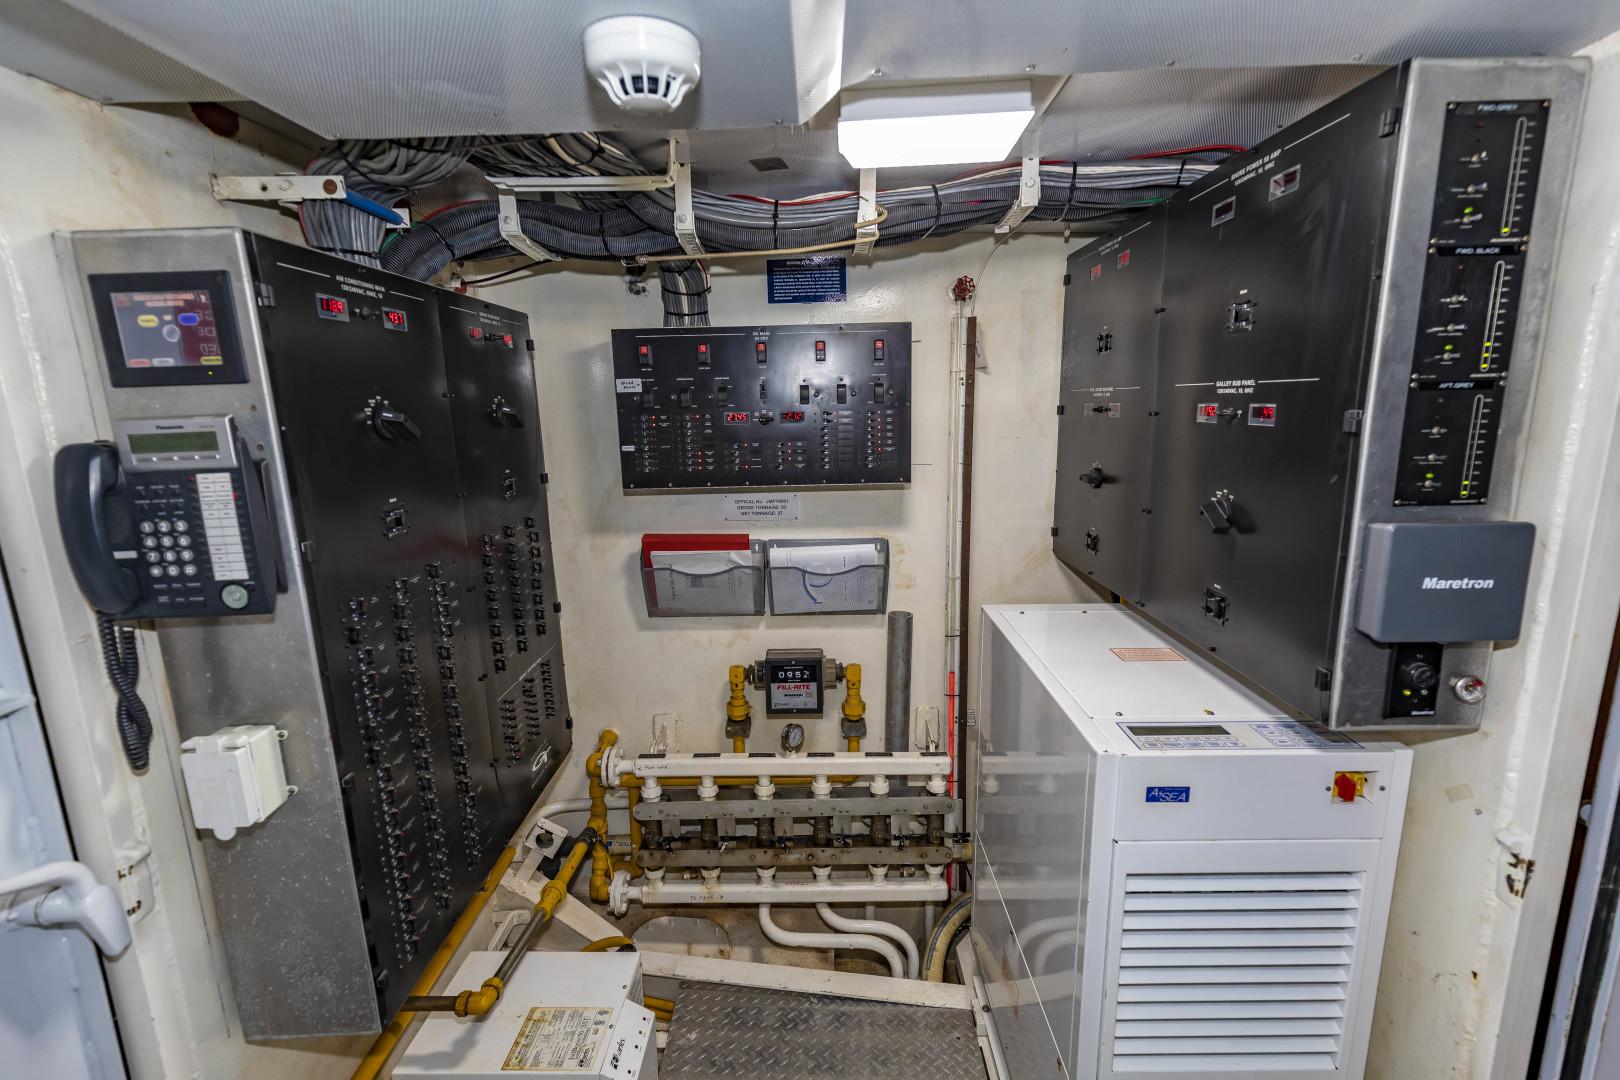 GlassTech-Expedition Yacht 2018-Reset Stuart-Florida-United States-Electrical Panel-1570476 | Thumbnail